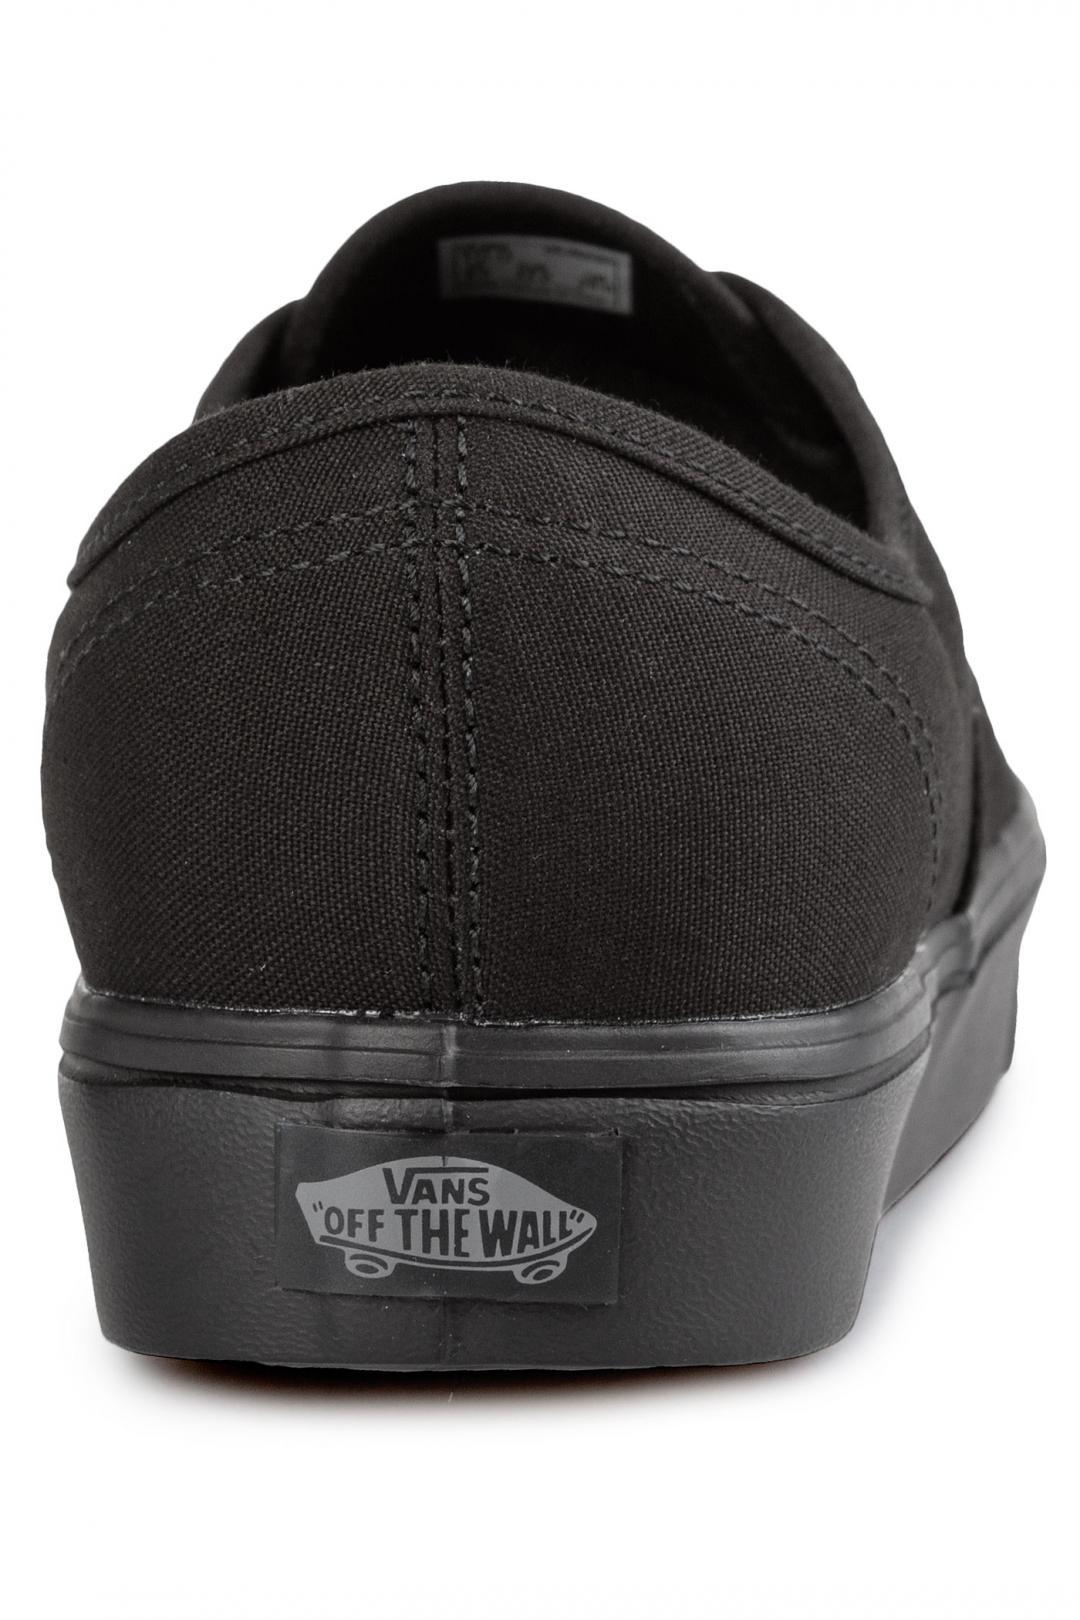 Uomo Vans Authentic Lite Canvas black | Sneaker